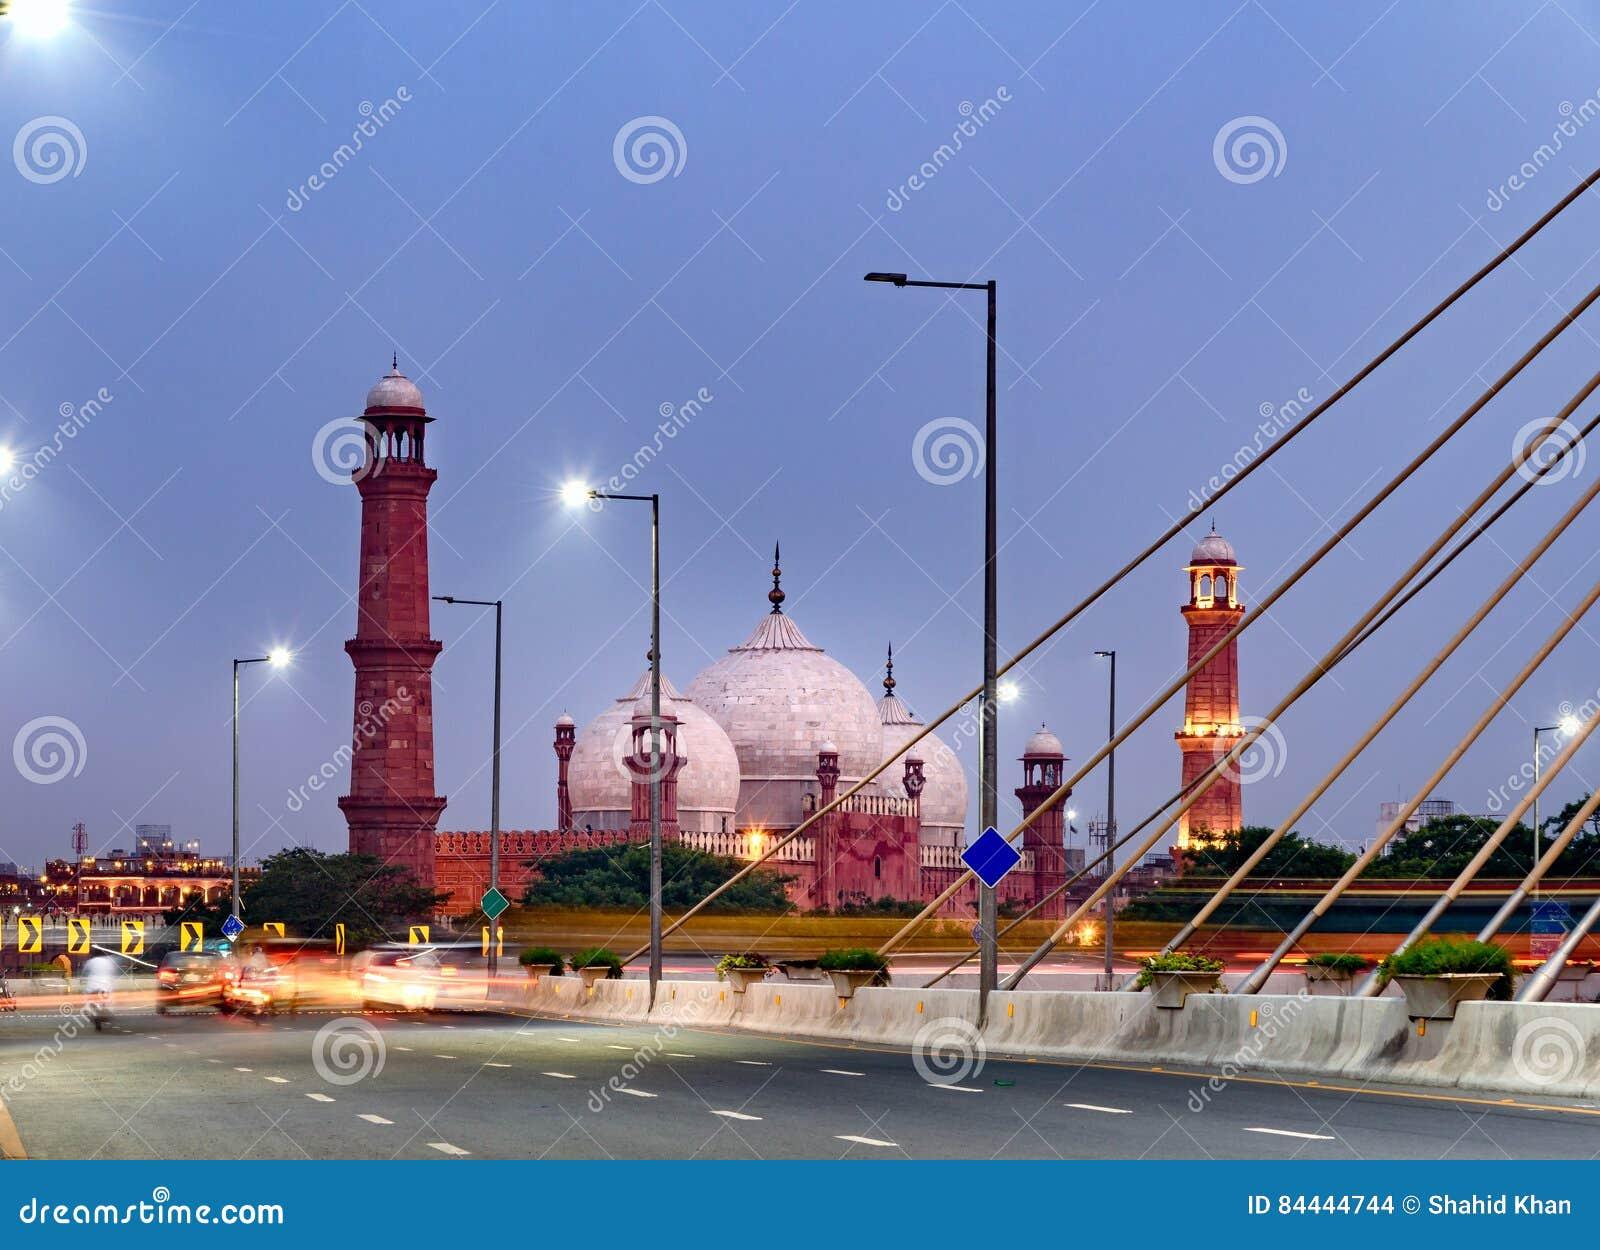 Mezquita Lahore Paquistán de Badshahi